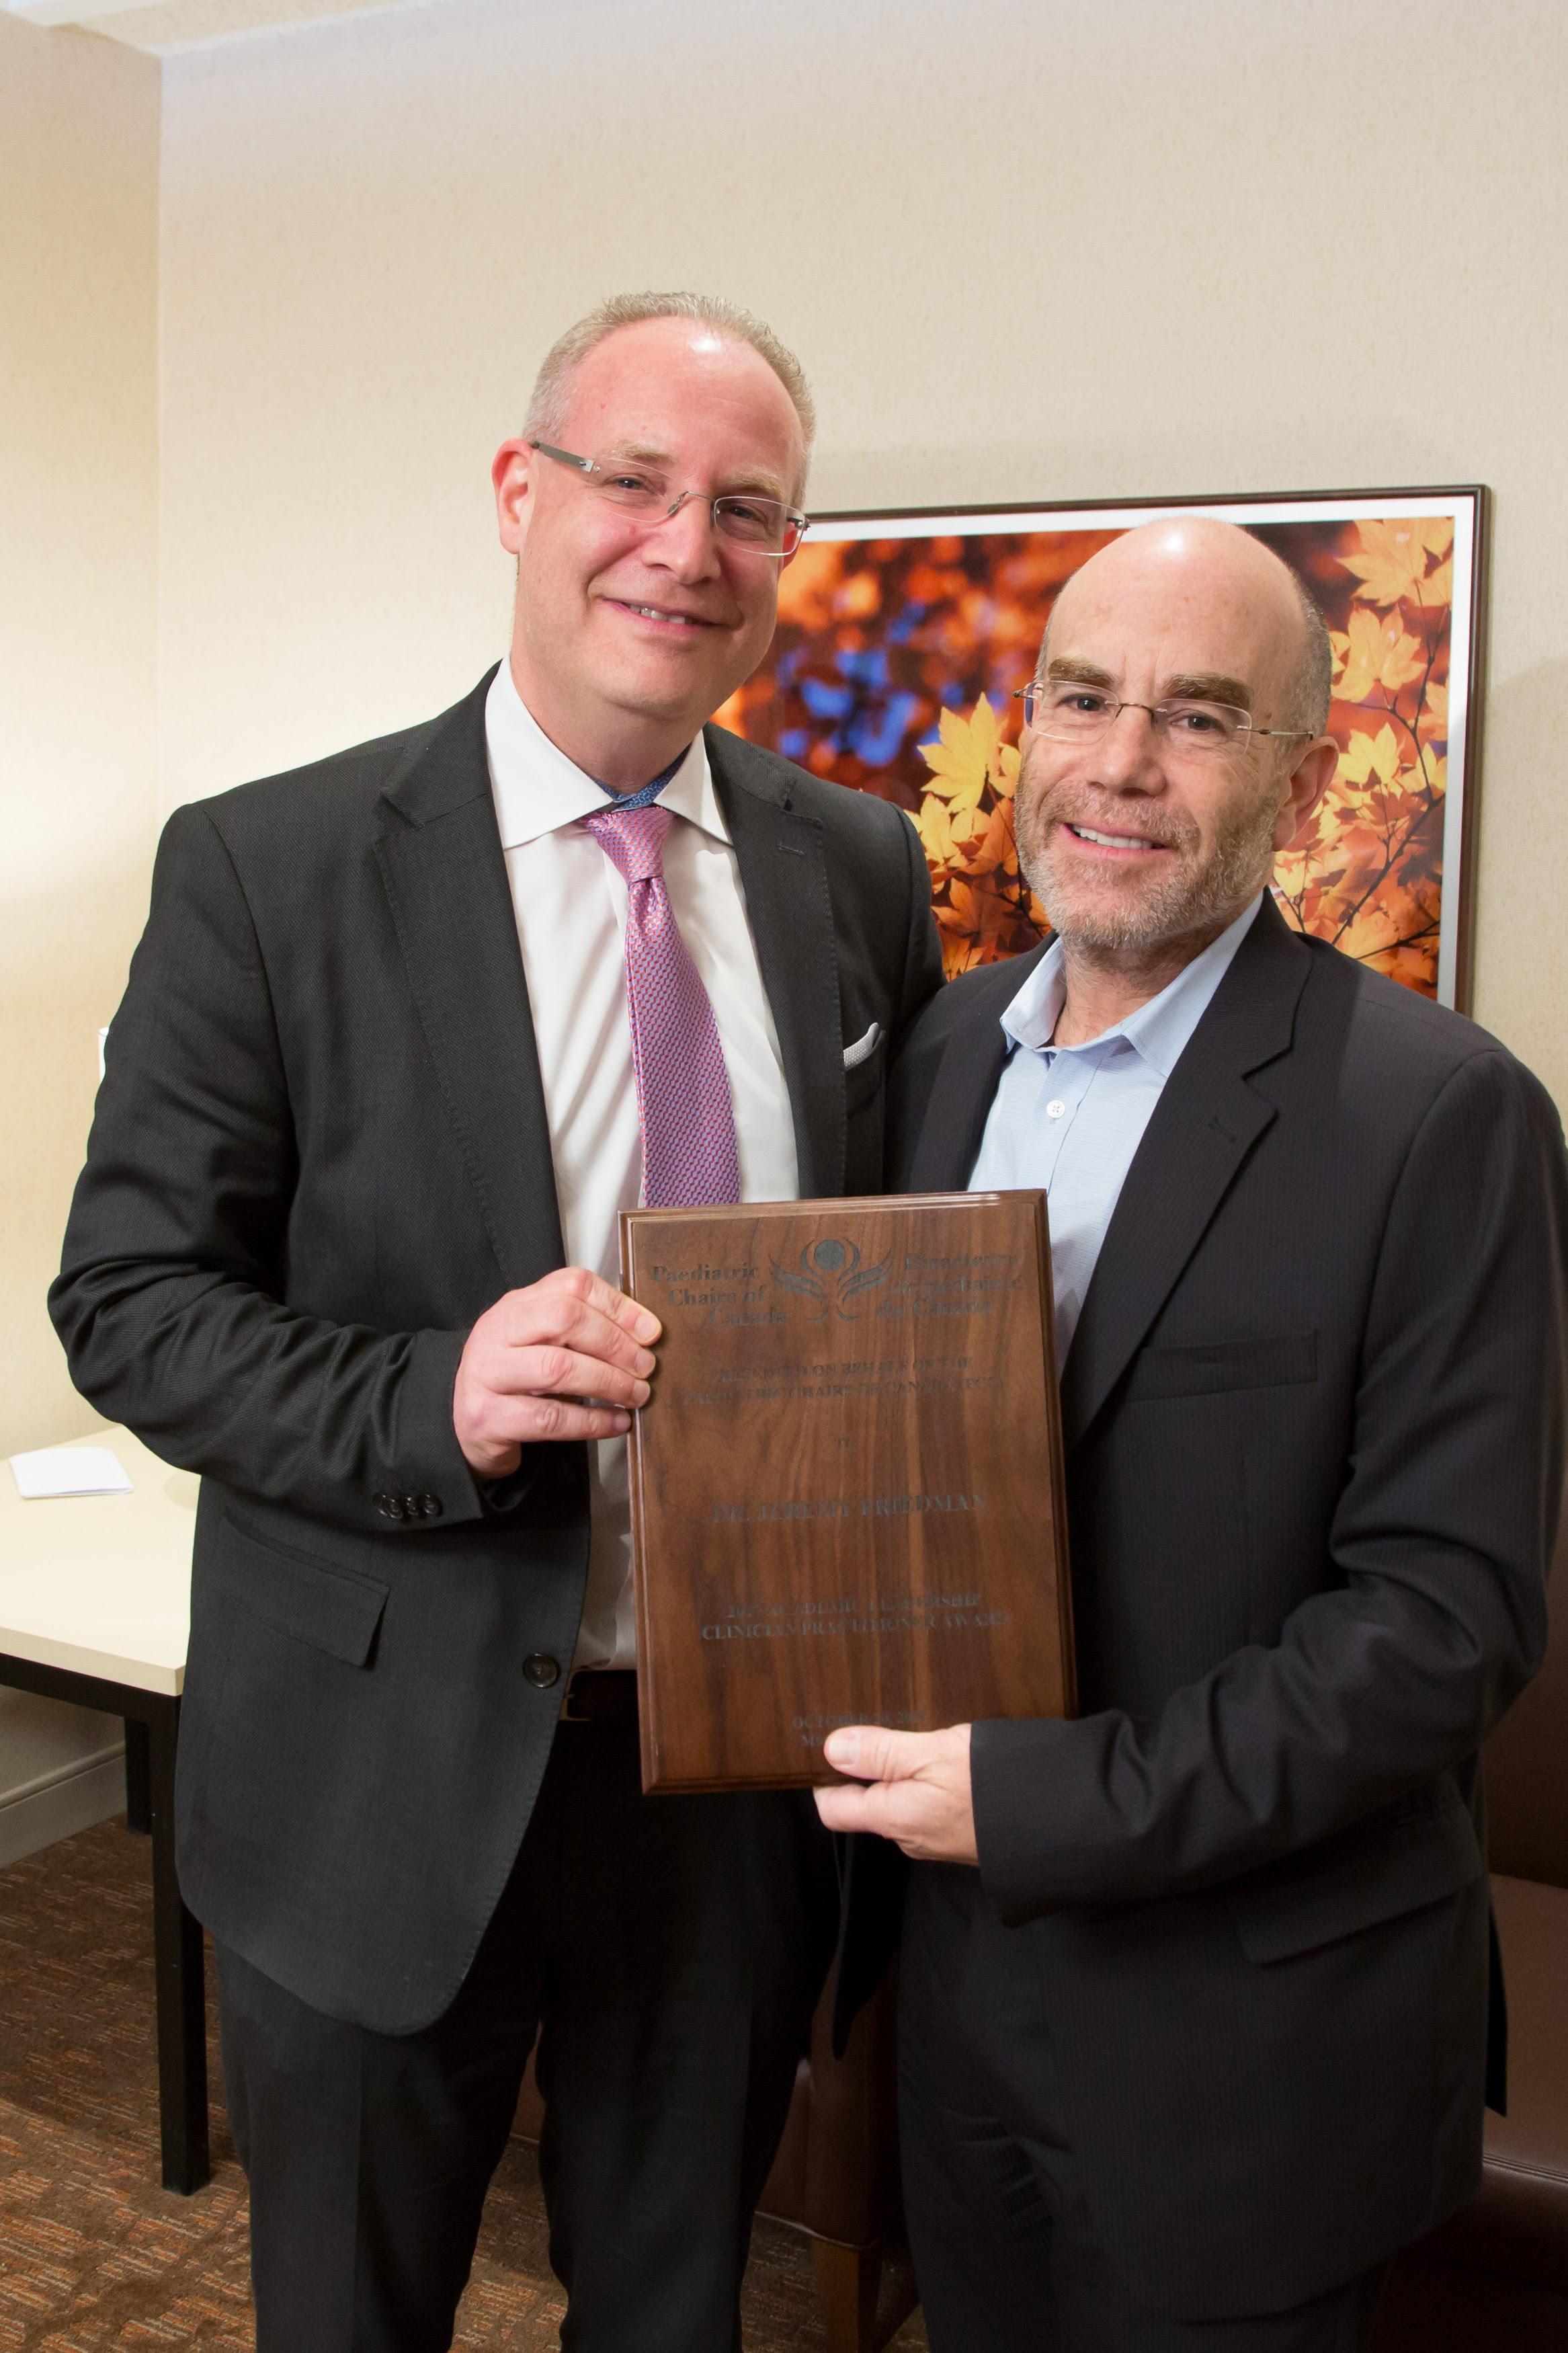 Dr. Ronald Cohn and Dr. Jeremy Friedman (both University of Toronto/SickKids)